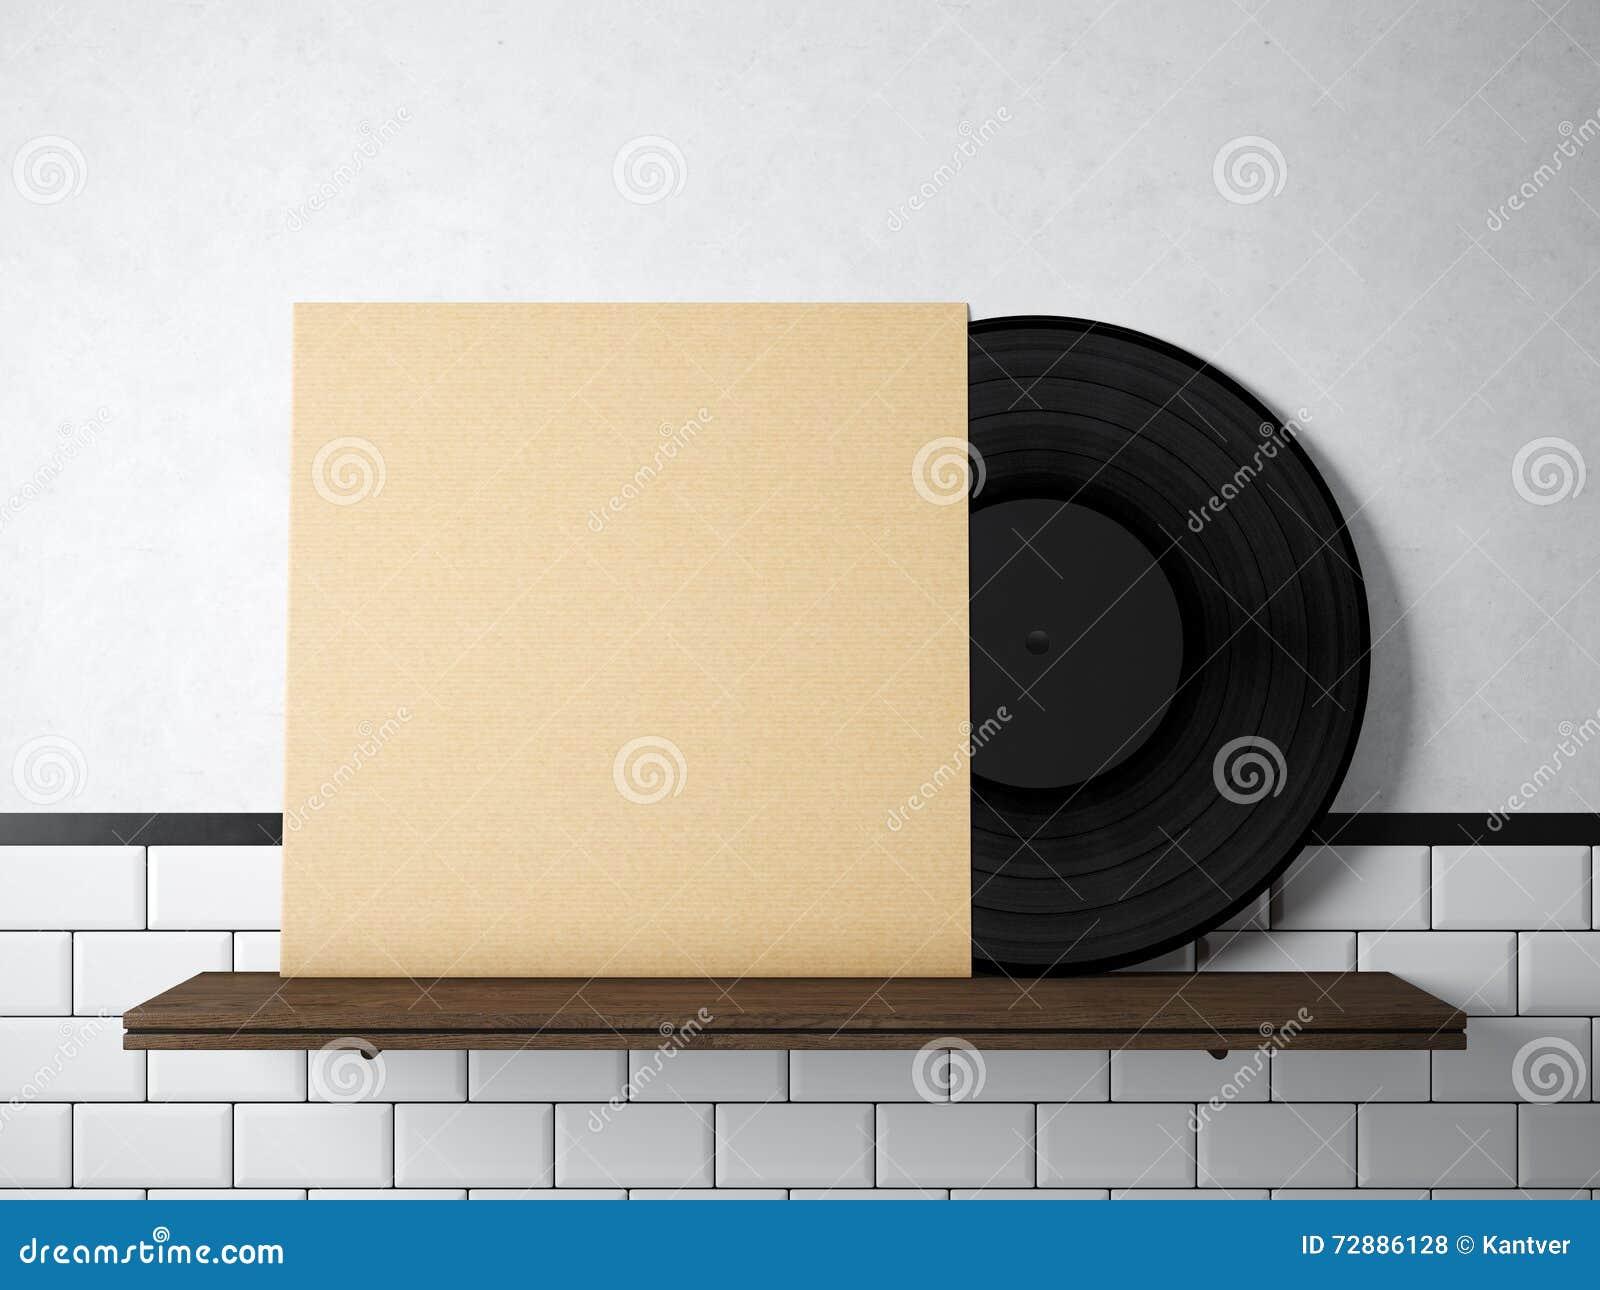 bookshelf music speaker vector illustration vector illustration 10090686. Black Bedroom Furniture Sets. Home Design Ideas